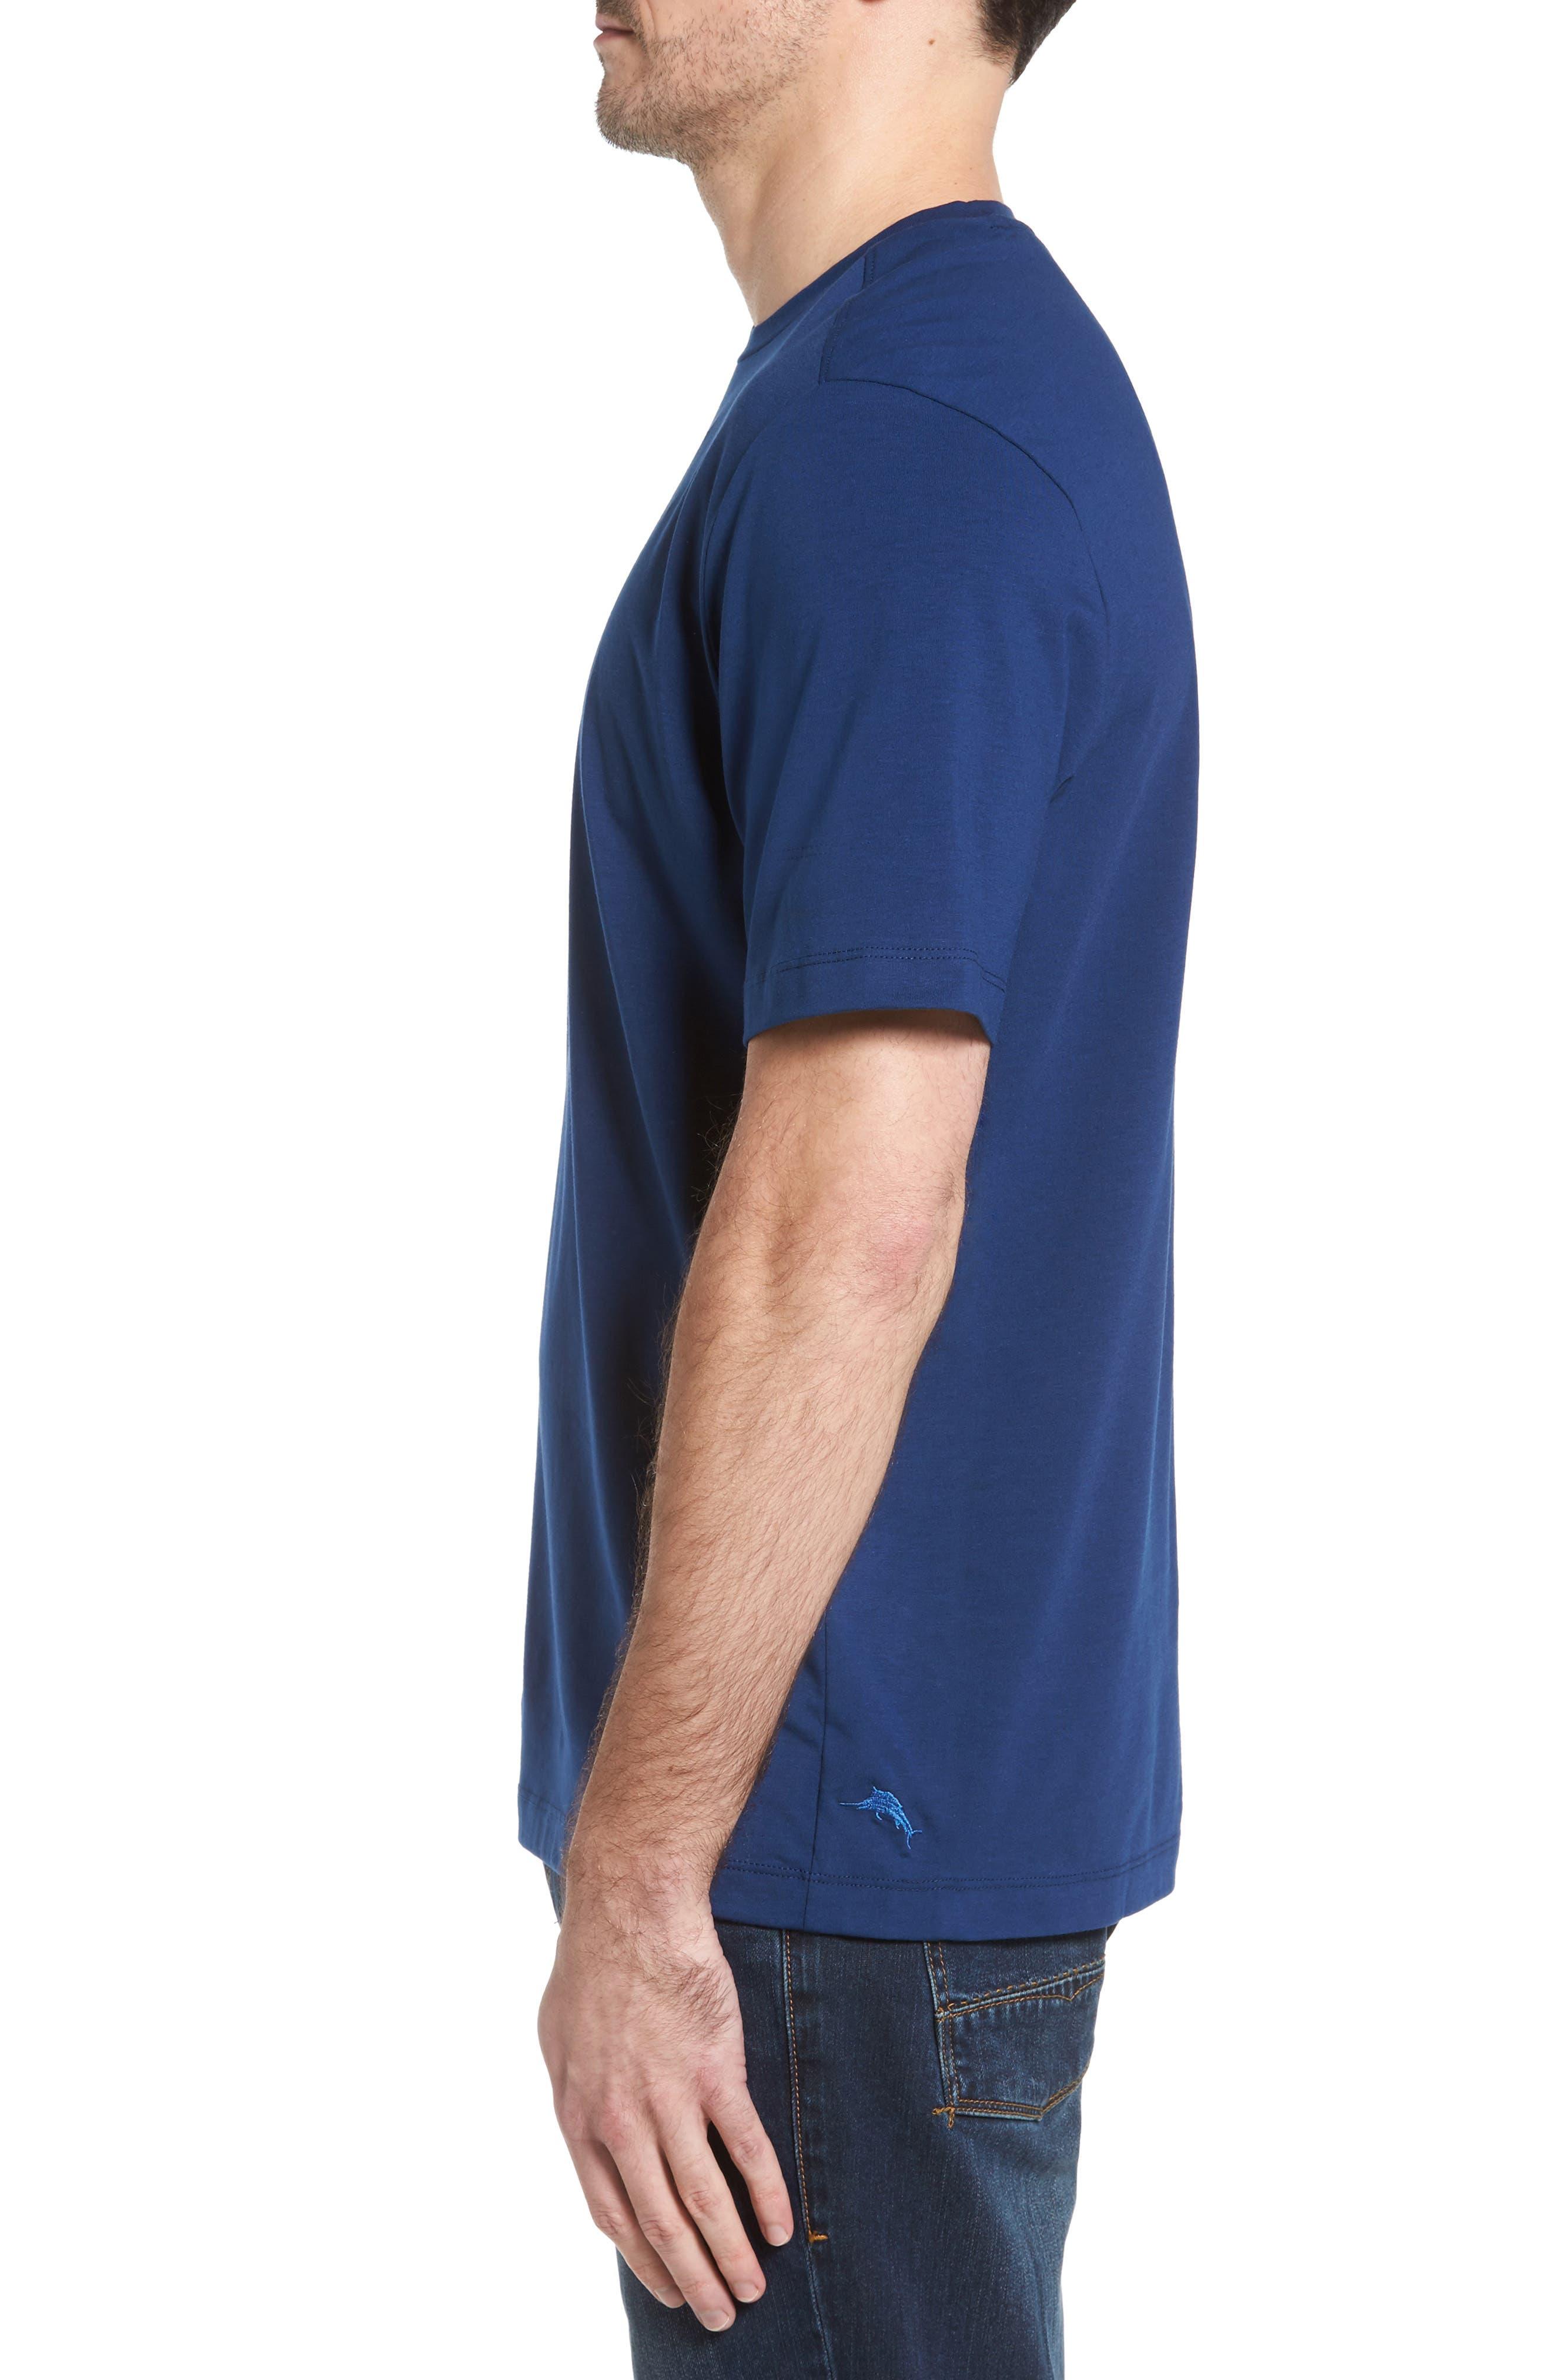 Tropicool T-Shirt,                             Alternate thumbnail 28, color,